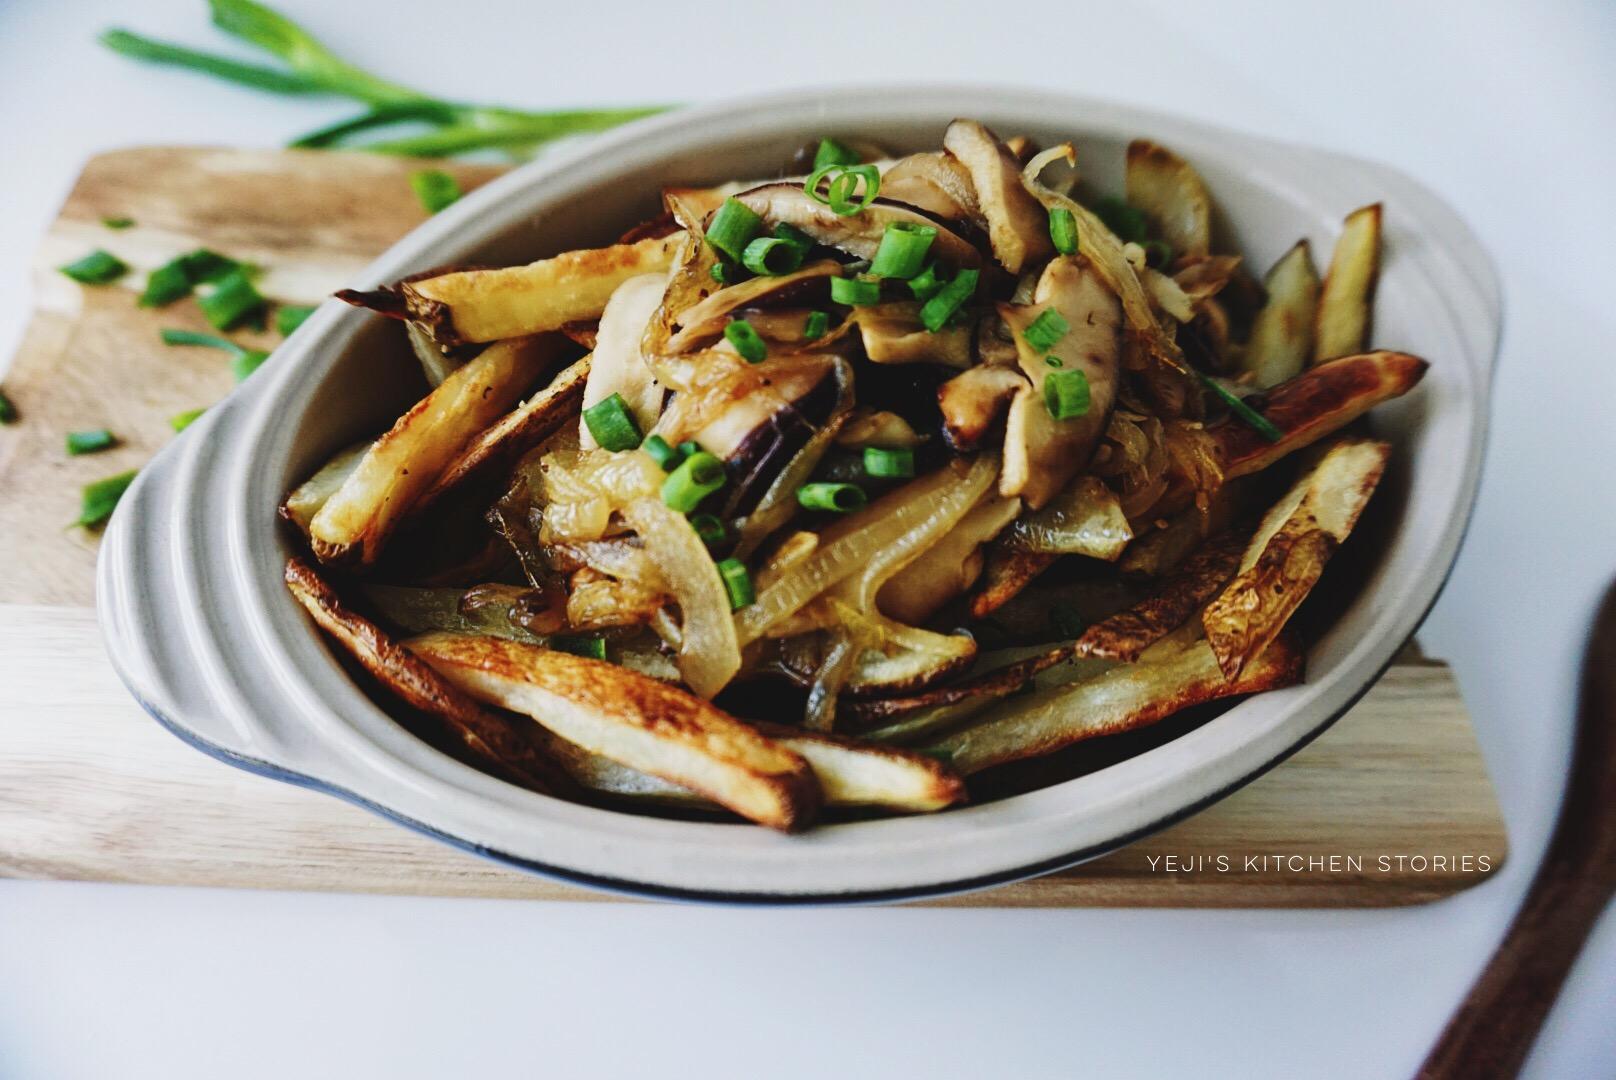 truffle-fries-caramelized-onions-shiitake-mushrooms